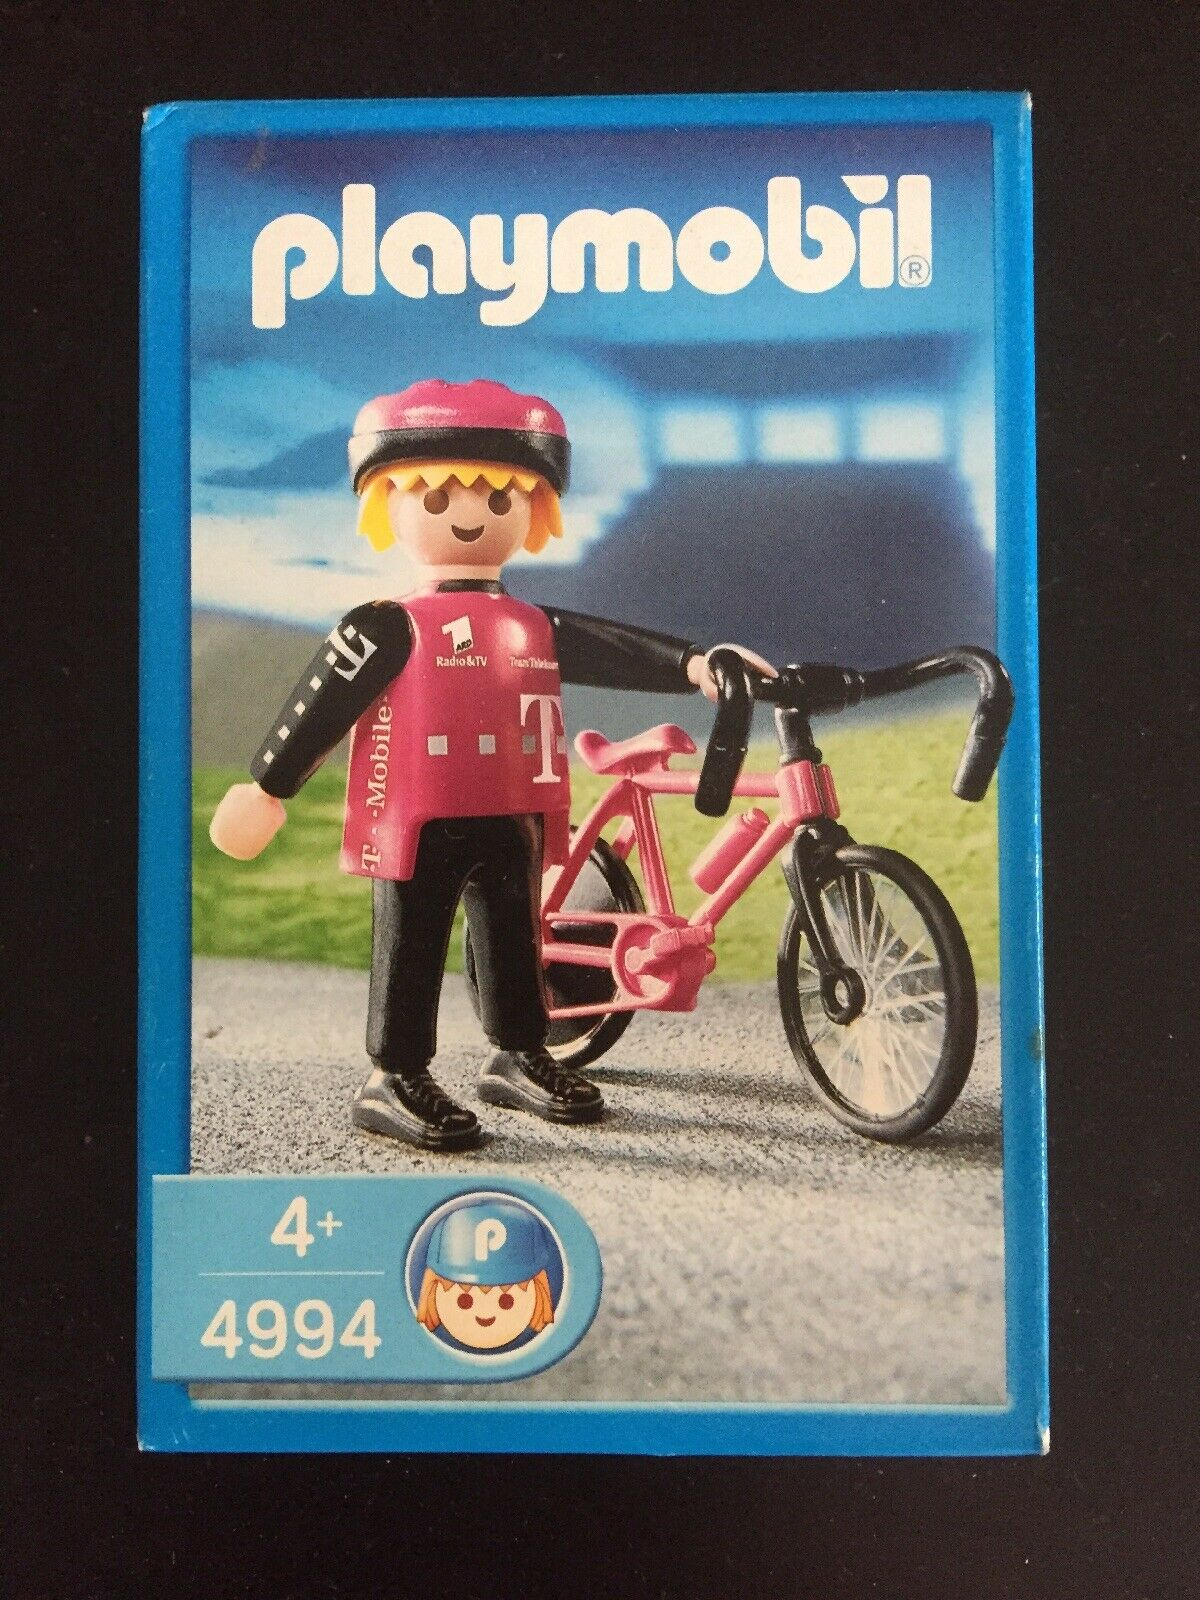 Playmobil 4994 Sonderfigur mit Rad Zeitfahren Telekom T-mobile Tour de France